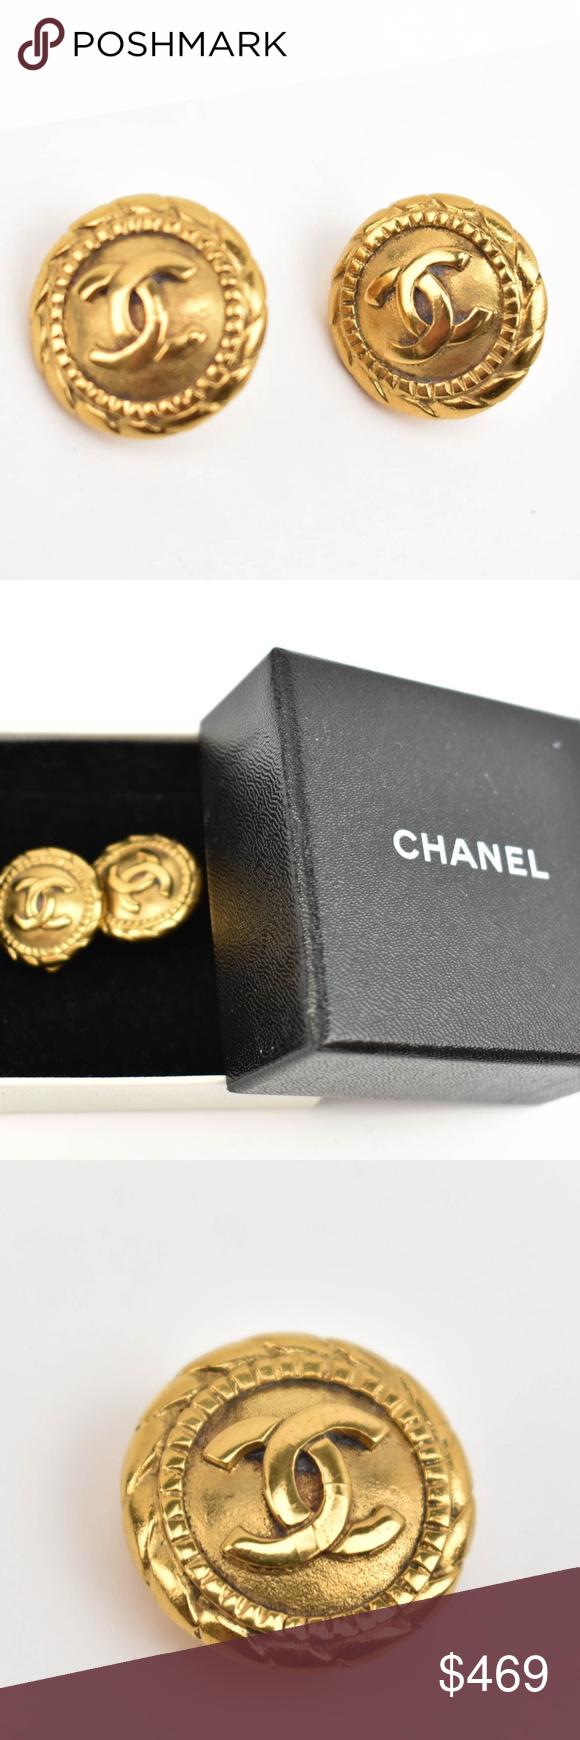 "CHANEL Gold, Metal & ""CC"" Logo Earrings (qr) Yellow gold"